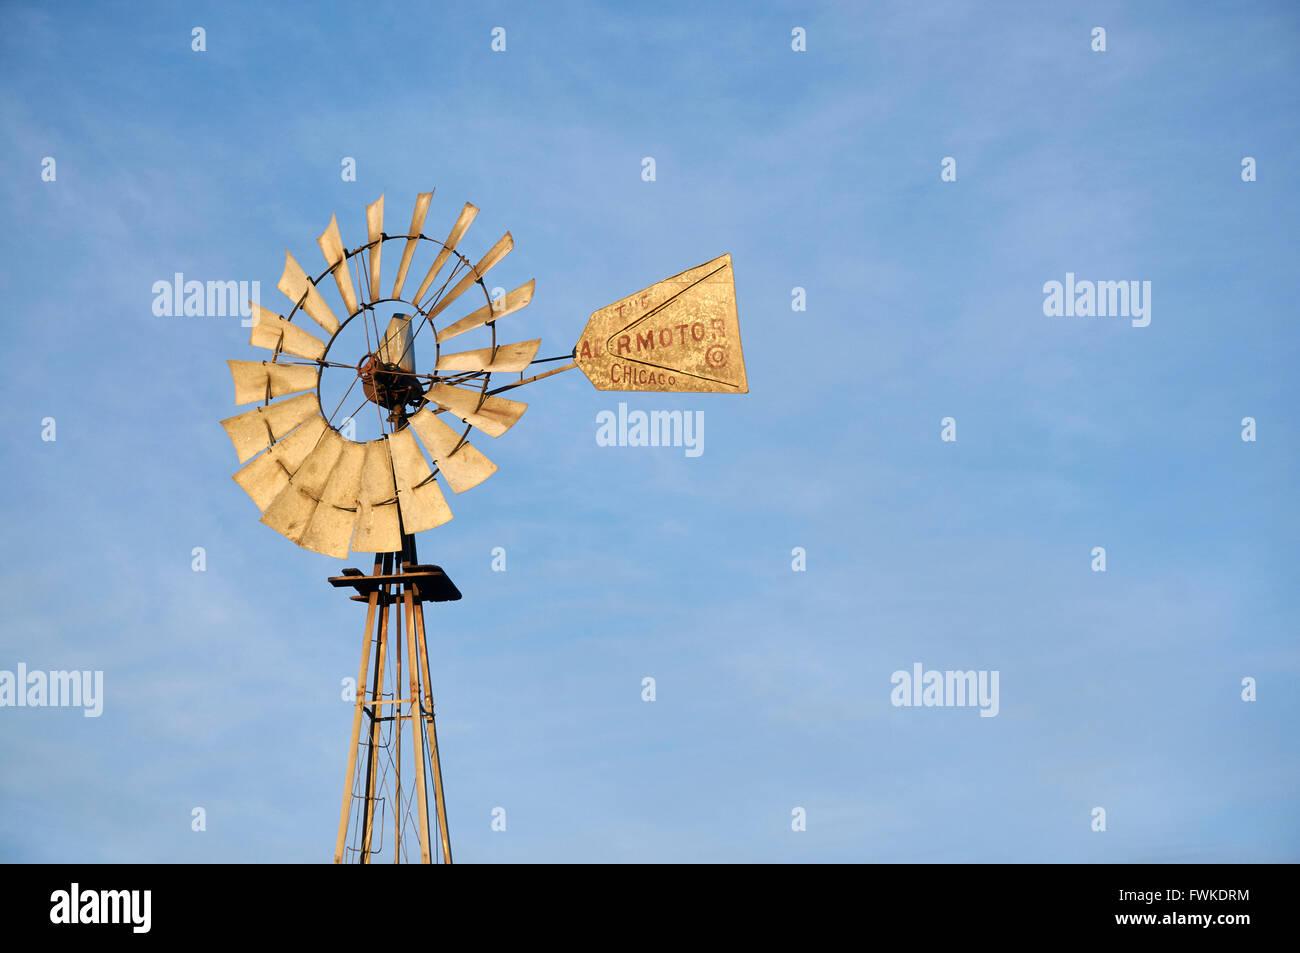 Windmill water pump, Big Bend country near Marathon, Texas, USA - Stock Image